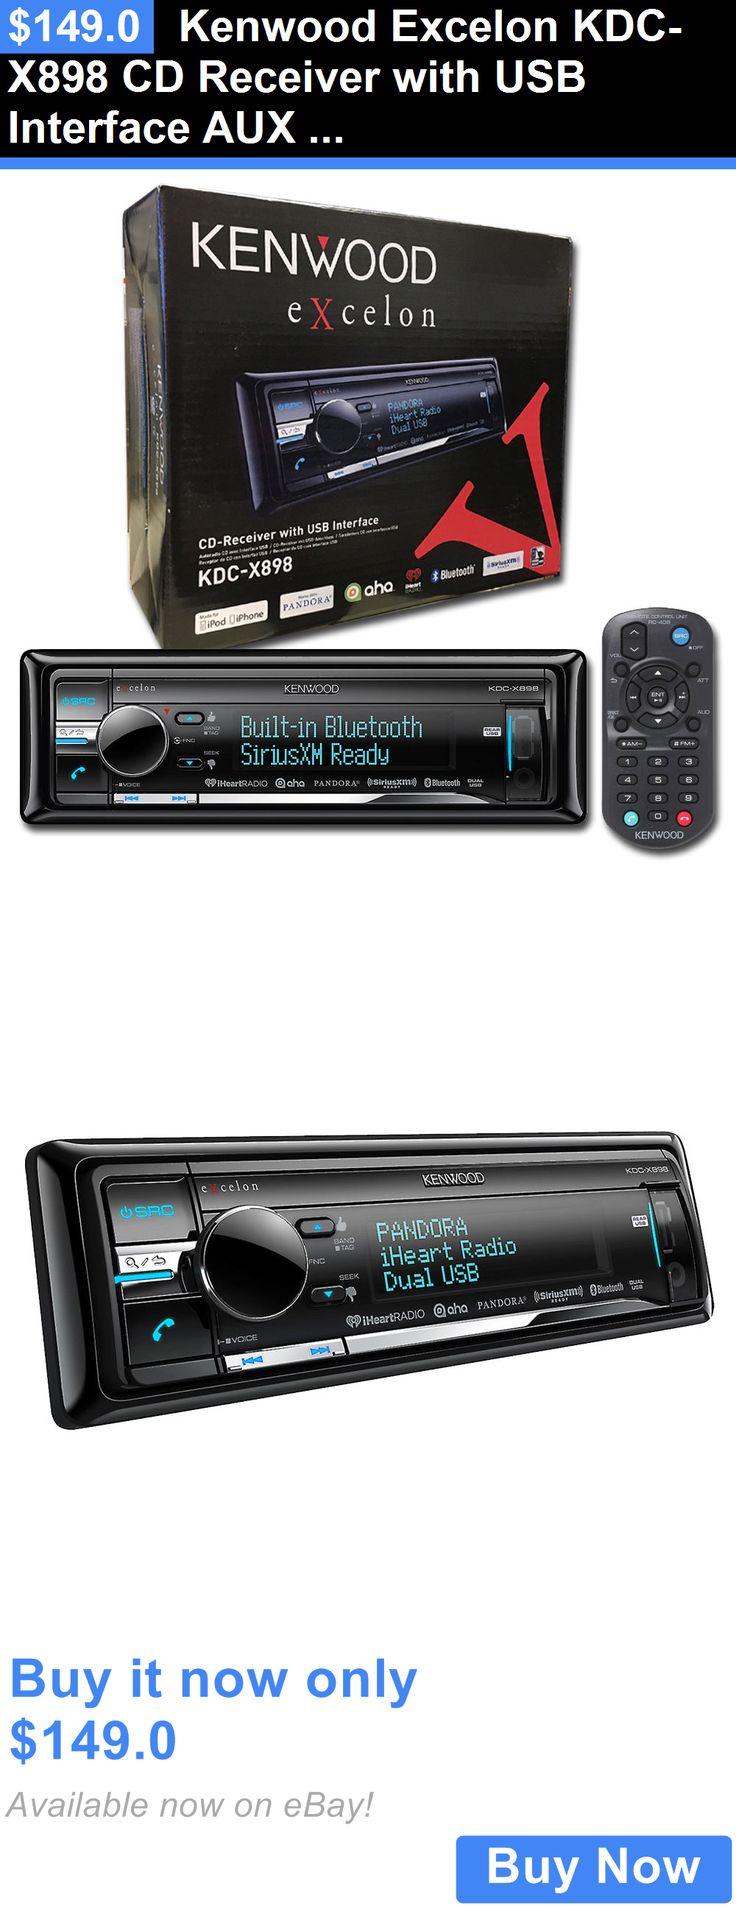 kenwood kdc x898 wiring diagram kenwood image 17 mejores ideas sobre kenwood car audio en audio coche on kenwood kdc x898 wiring · kenwood excelon kdc x898 cd receiver